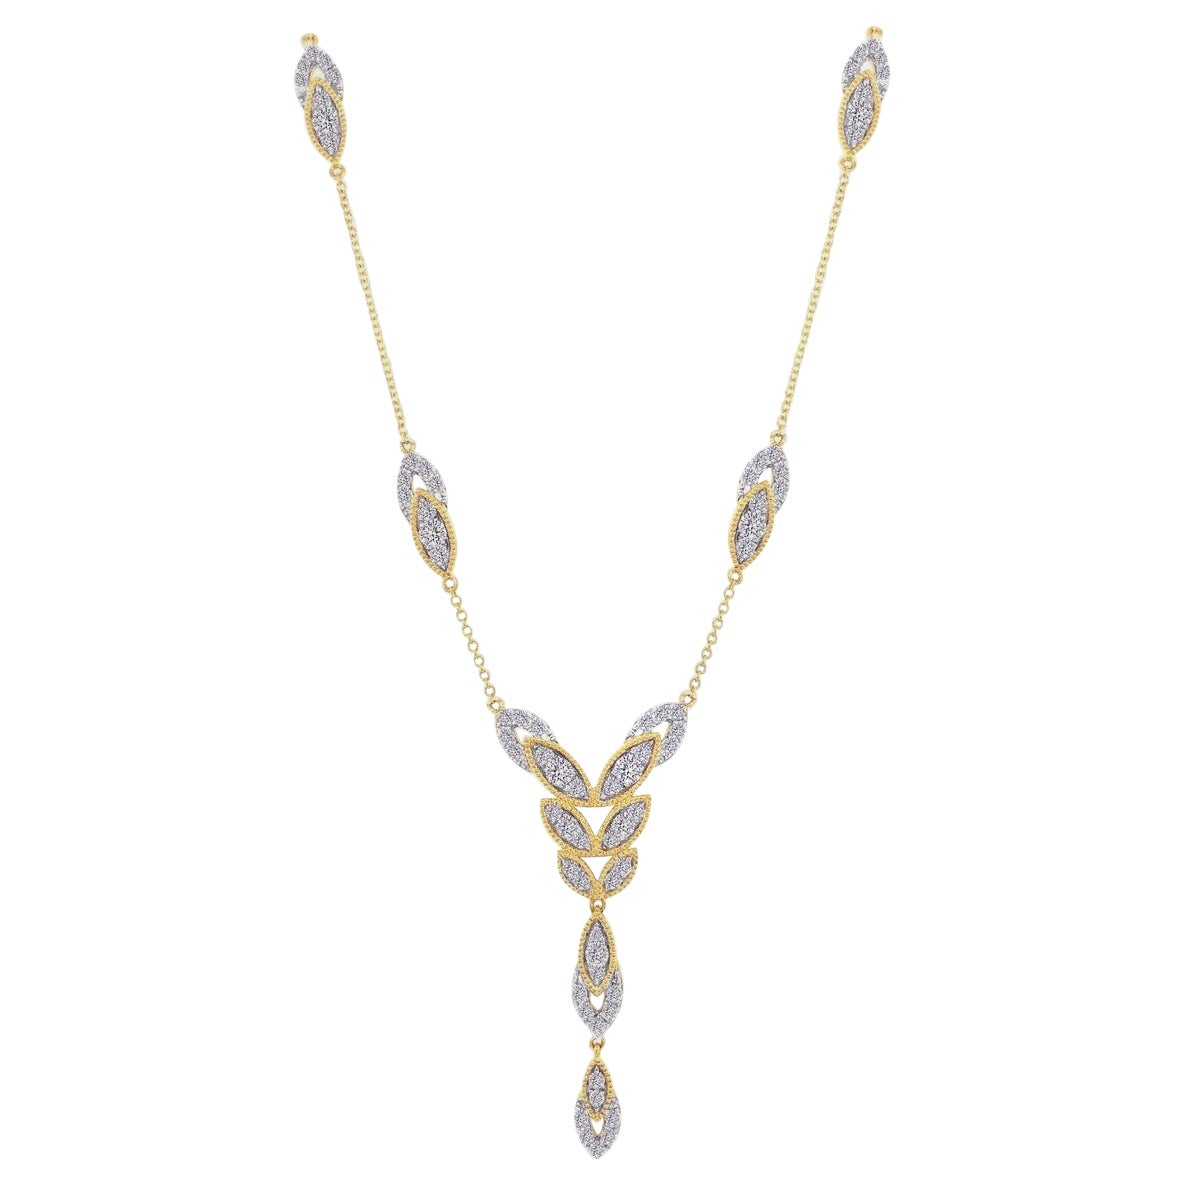 Diamond Bloom Long Necklace in 18 Karat Gold